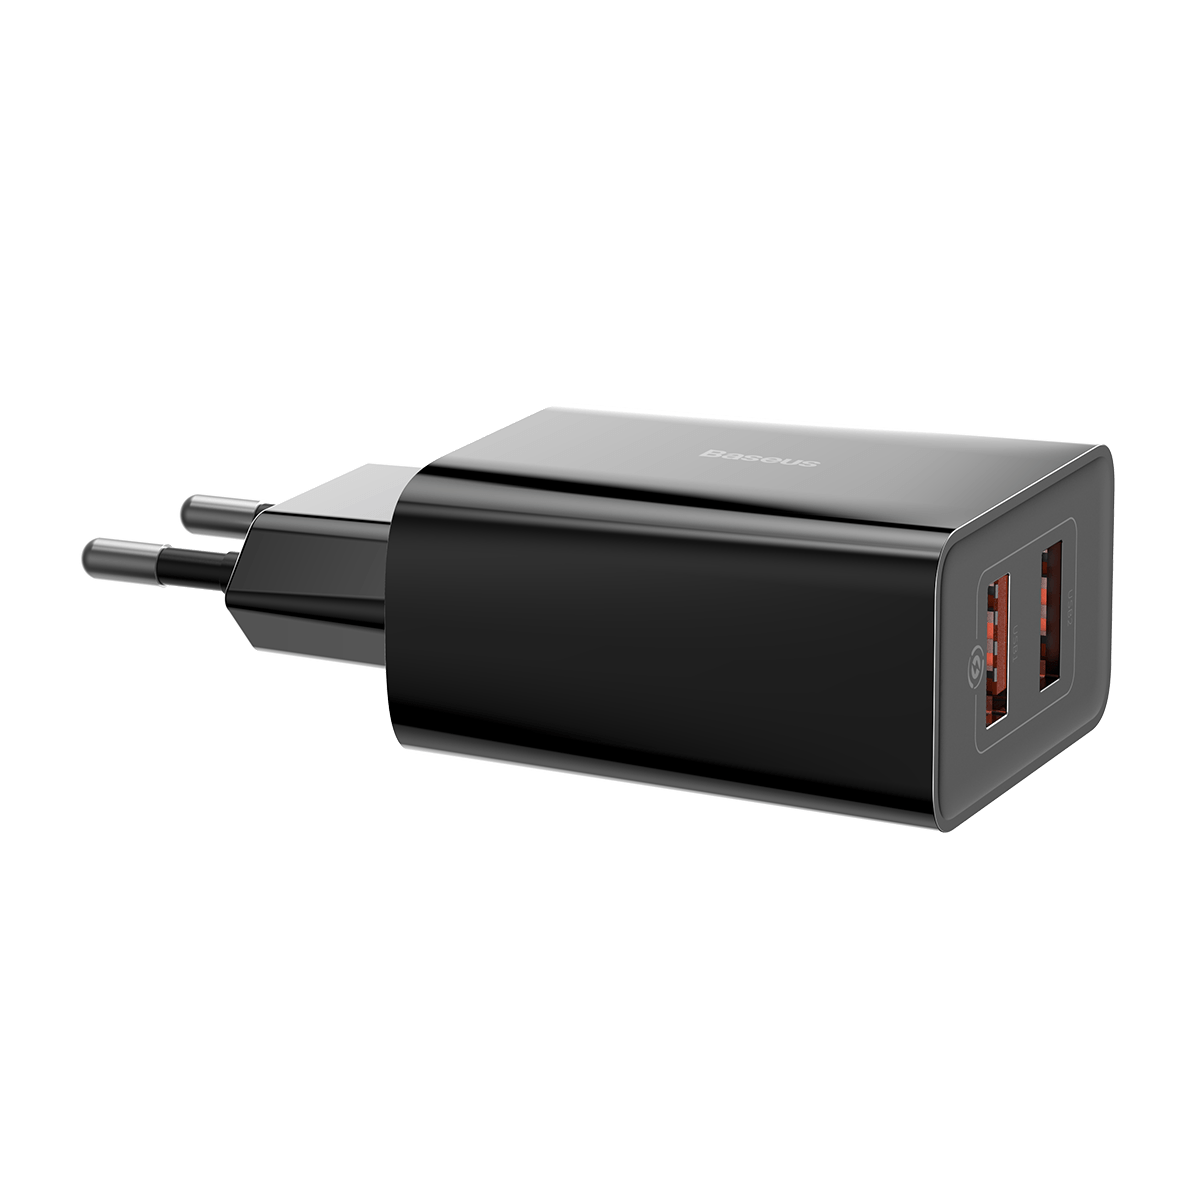 Carregador de Parede Baseus Speed Mini QC Dual 18w